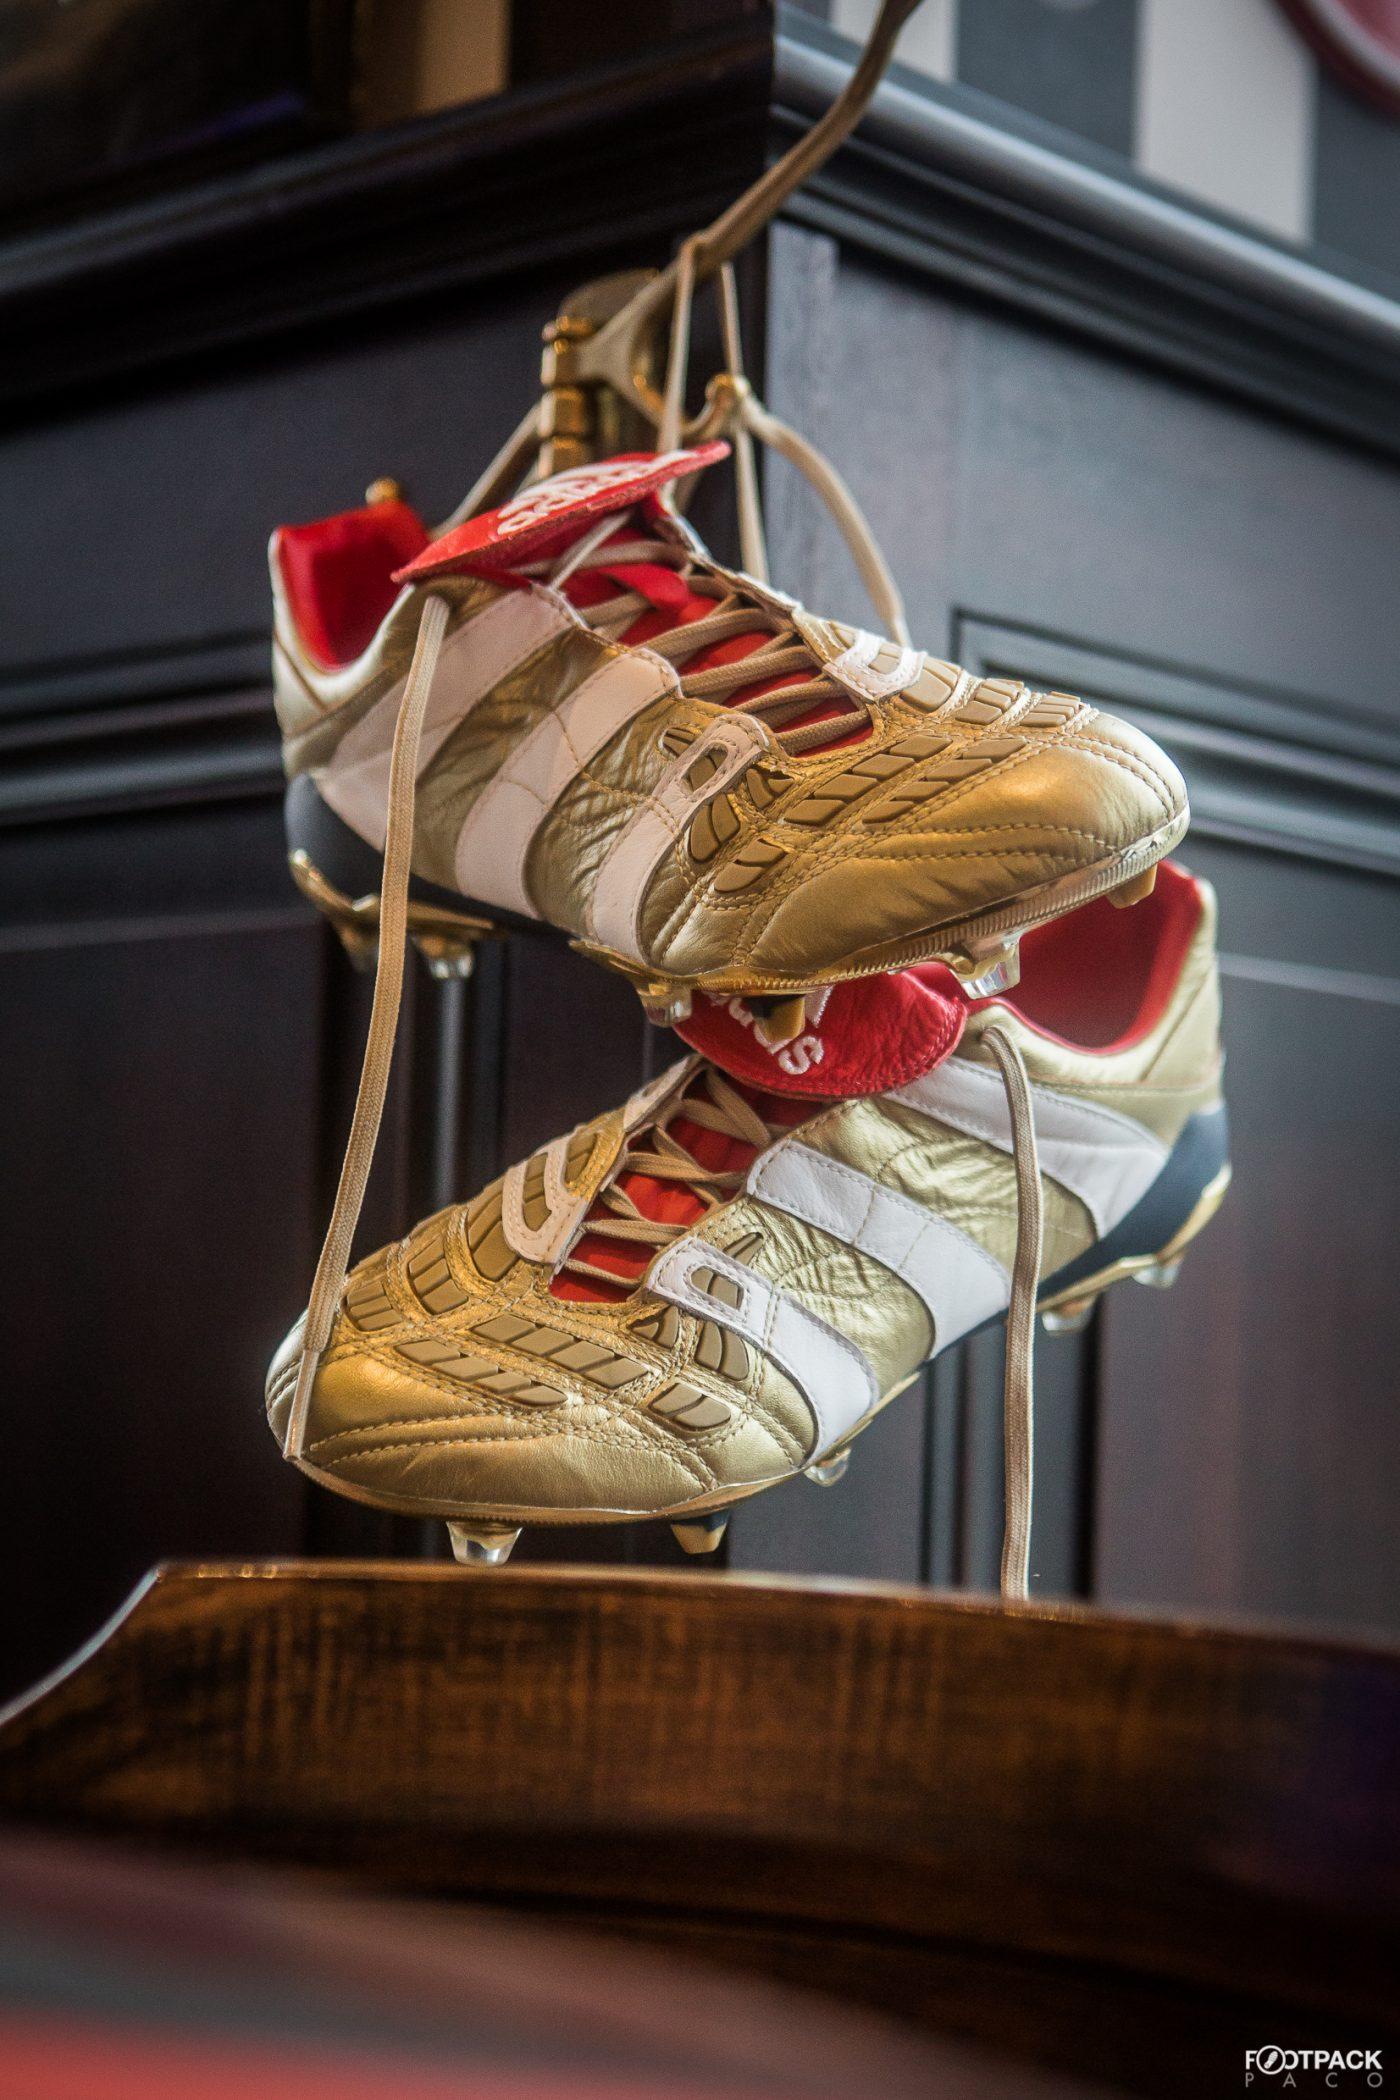 adidas-predator-accelerator-zinedine-zidane-collection-limitee-25-ans-predator-footpack-2